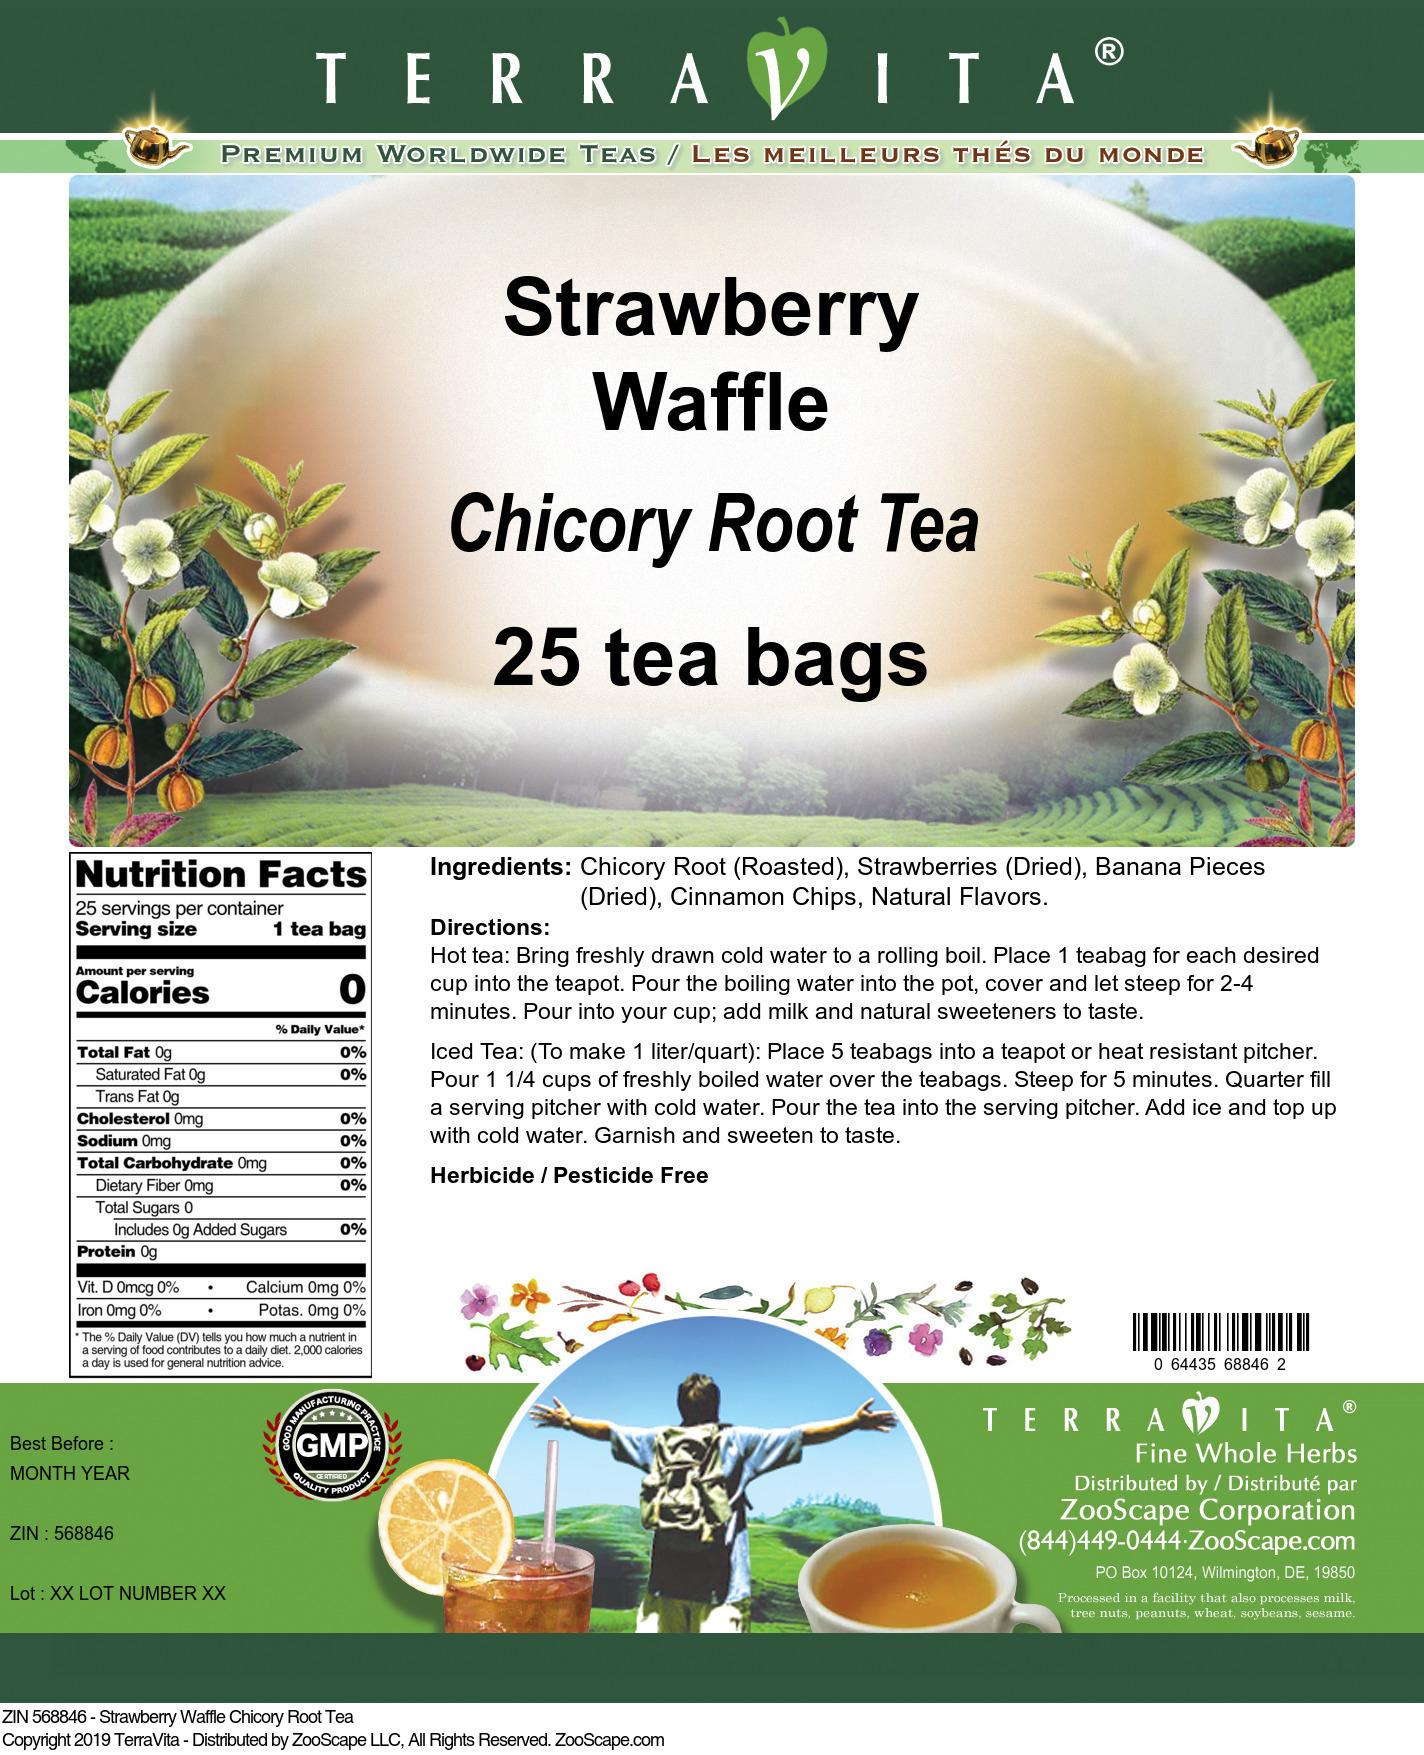 Strawberry Waffle Chicory Root Tea